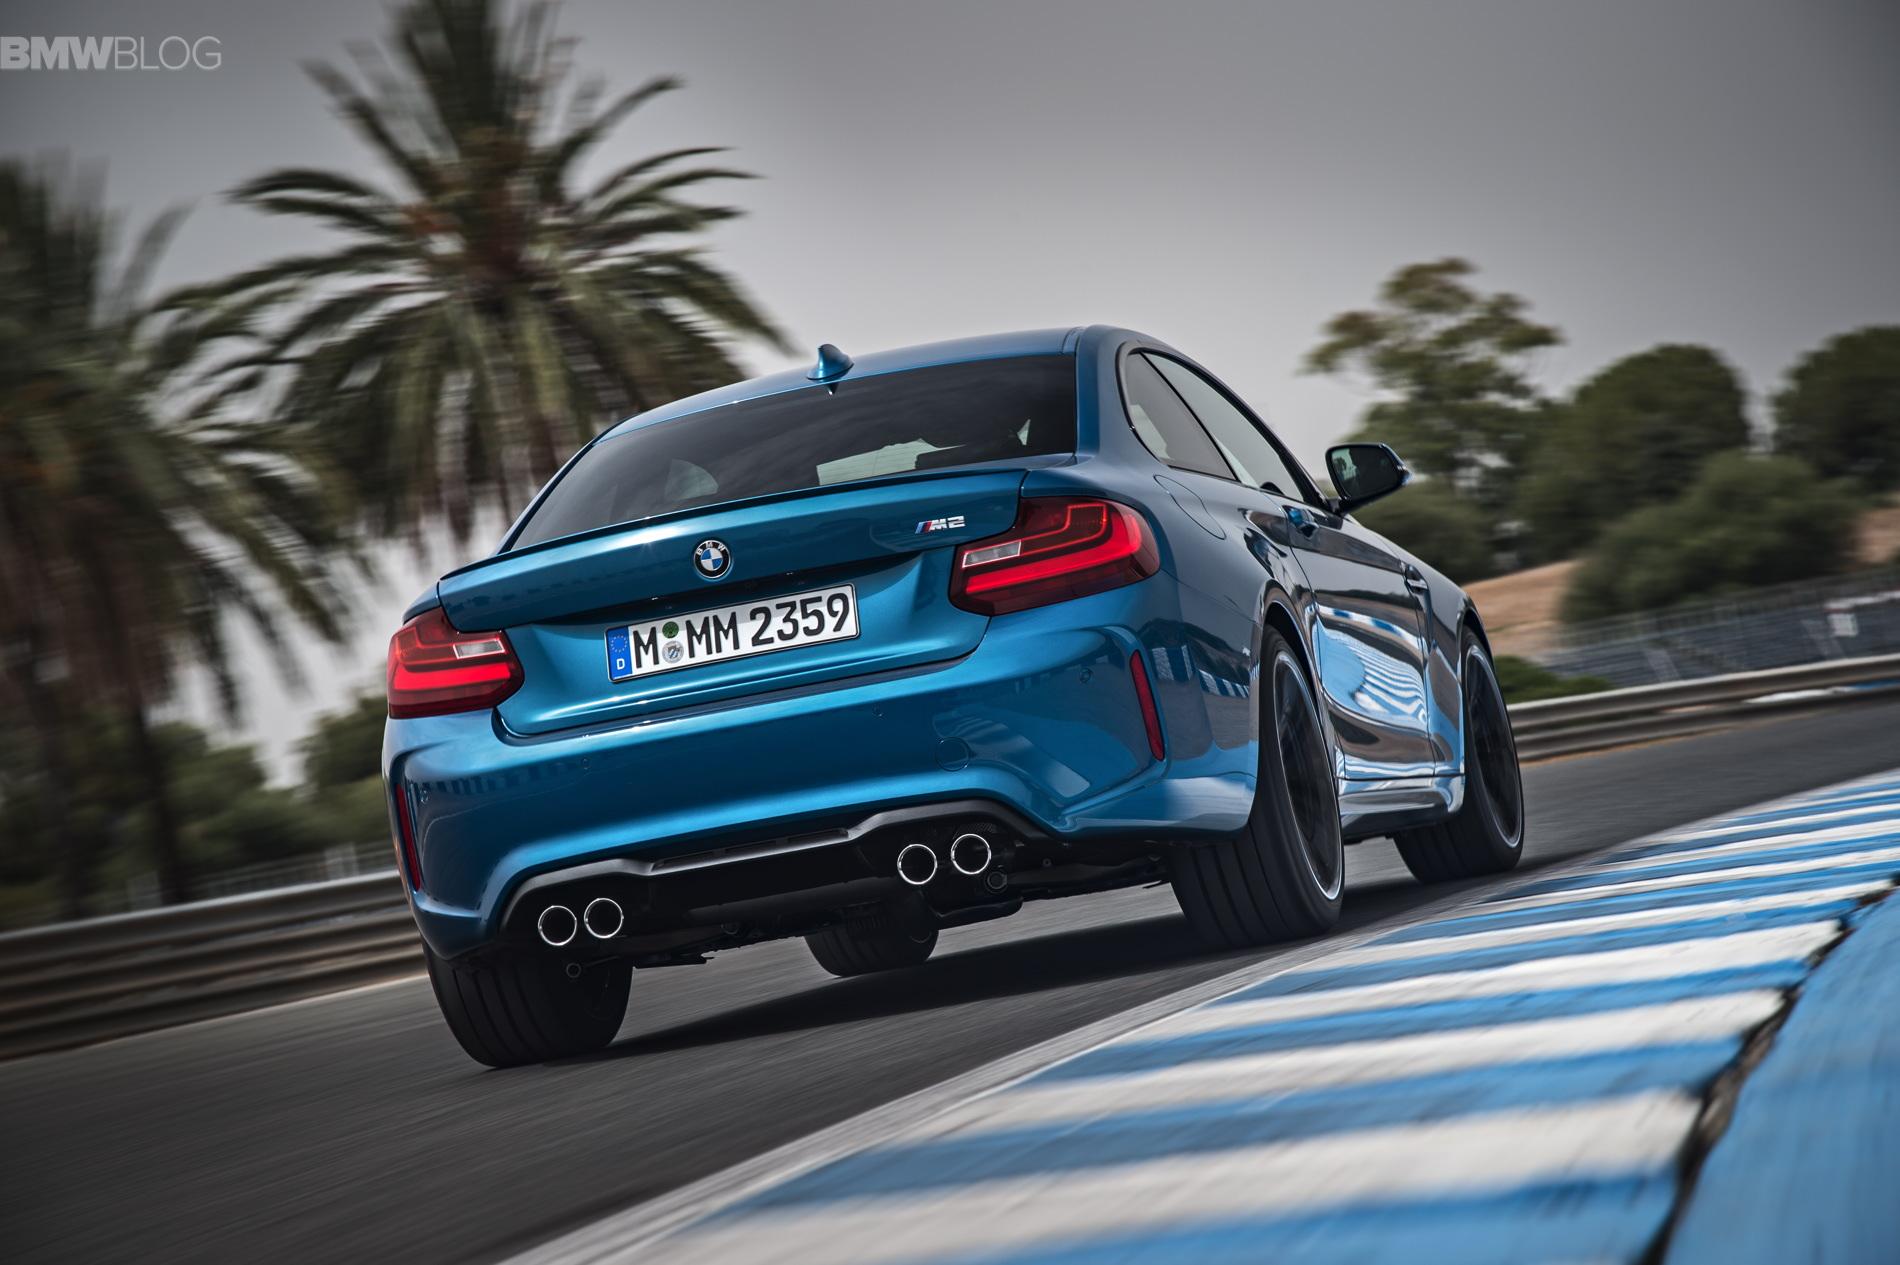 BMW M2 images 30